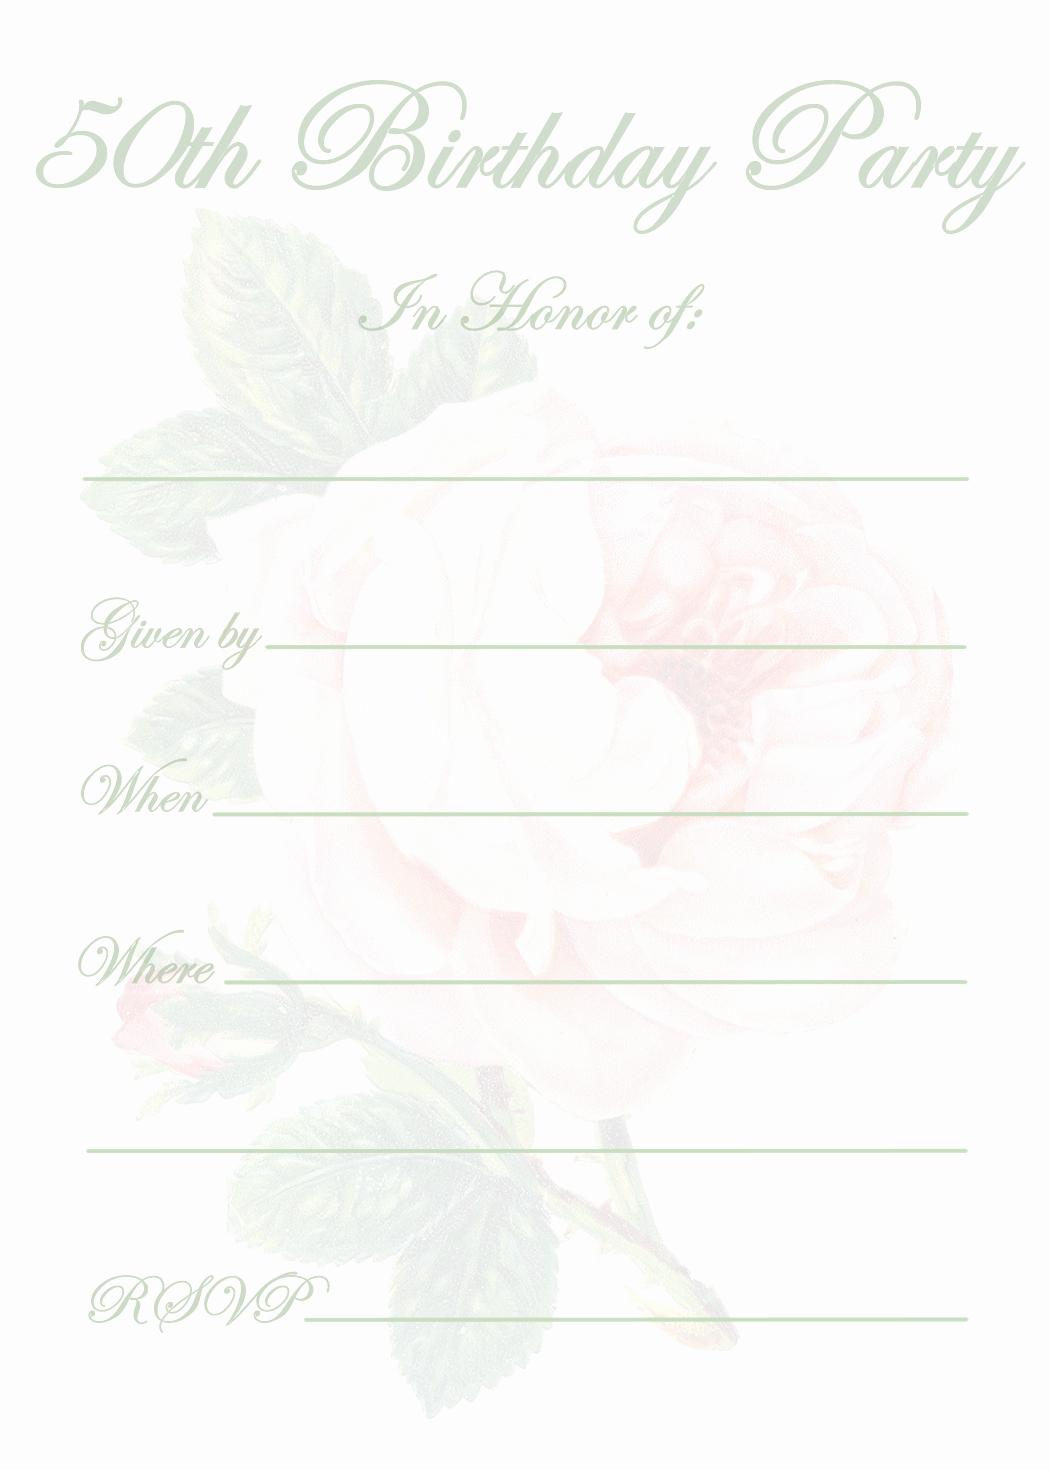 50th Birthday Invitation Templates Elegant Free Printable 50th Birthday Party Invitation Templates